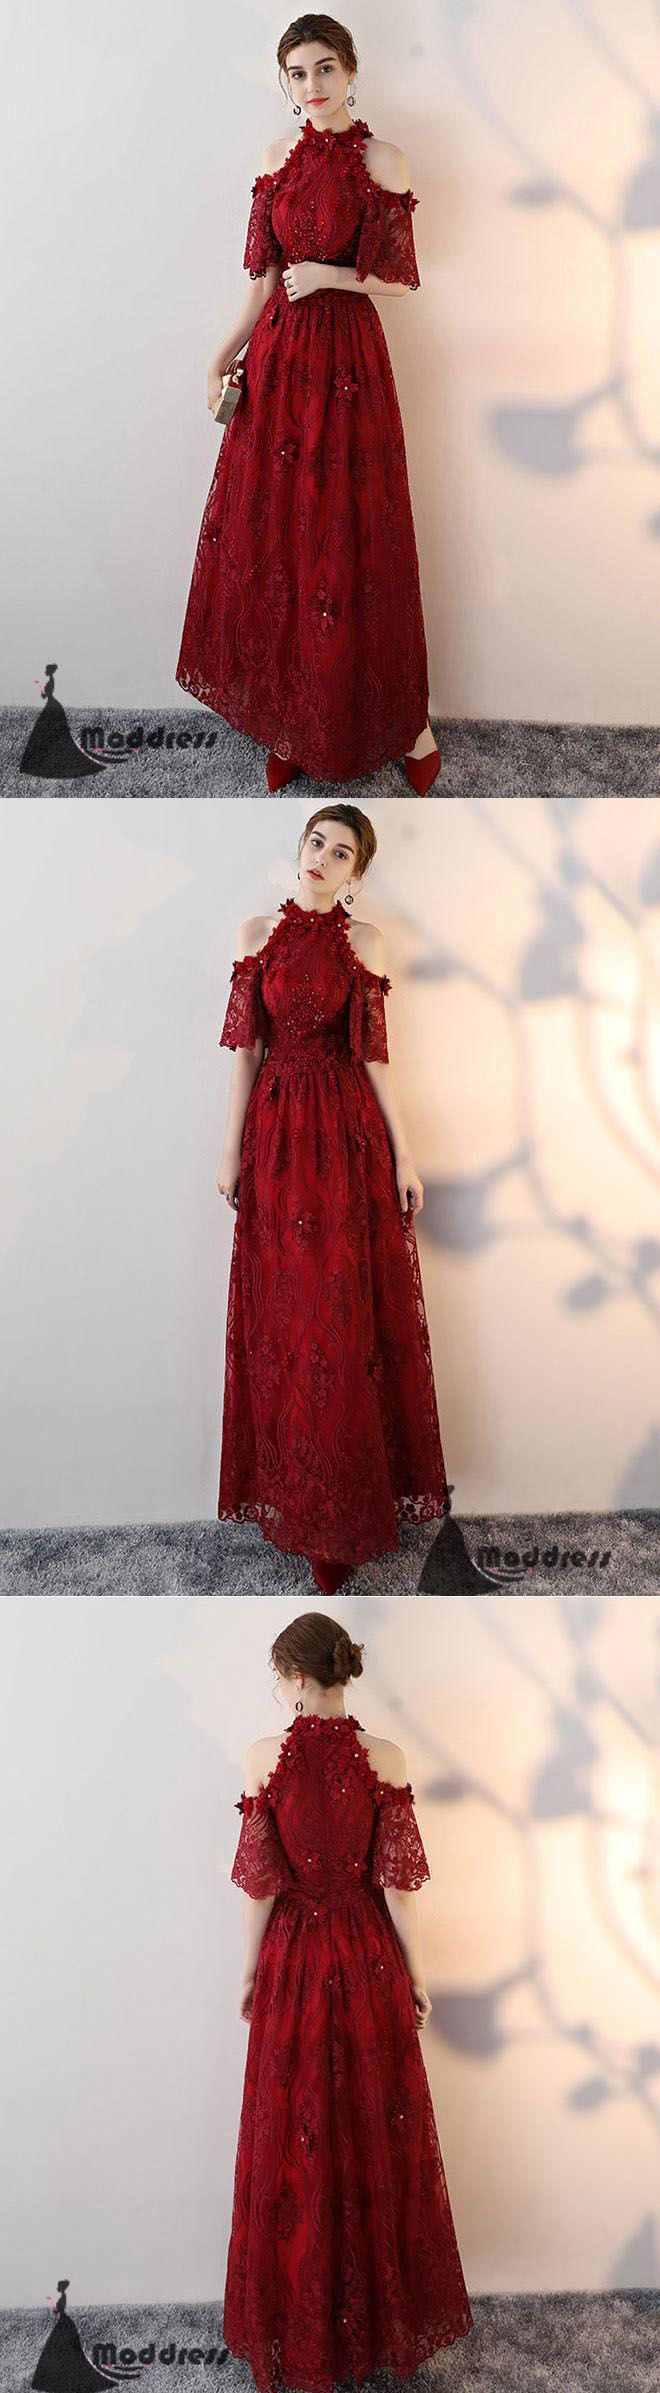 Unique lace long prom dress high neck evening dress aline red